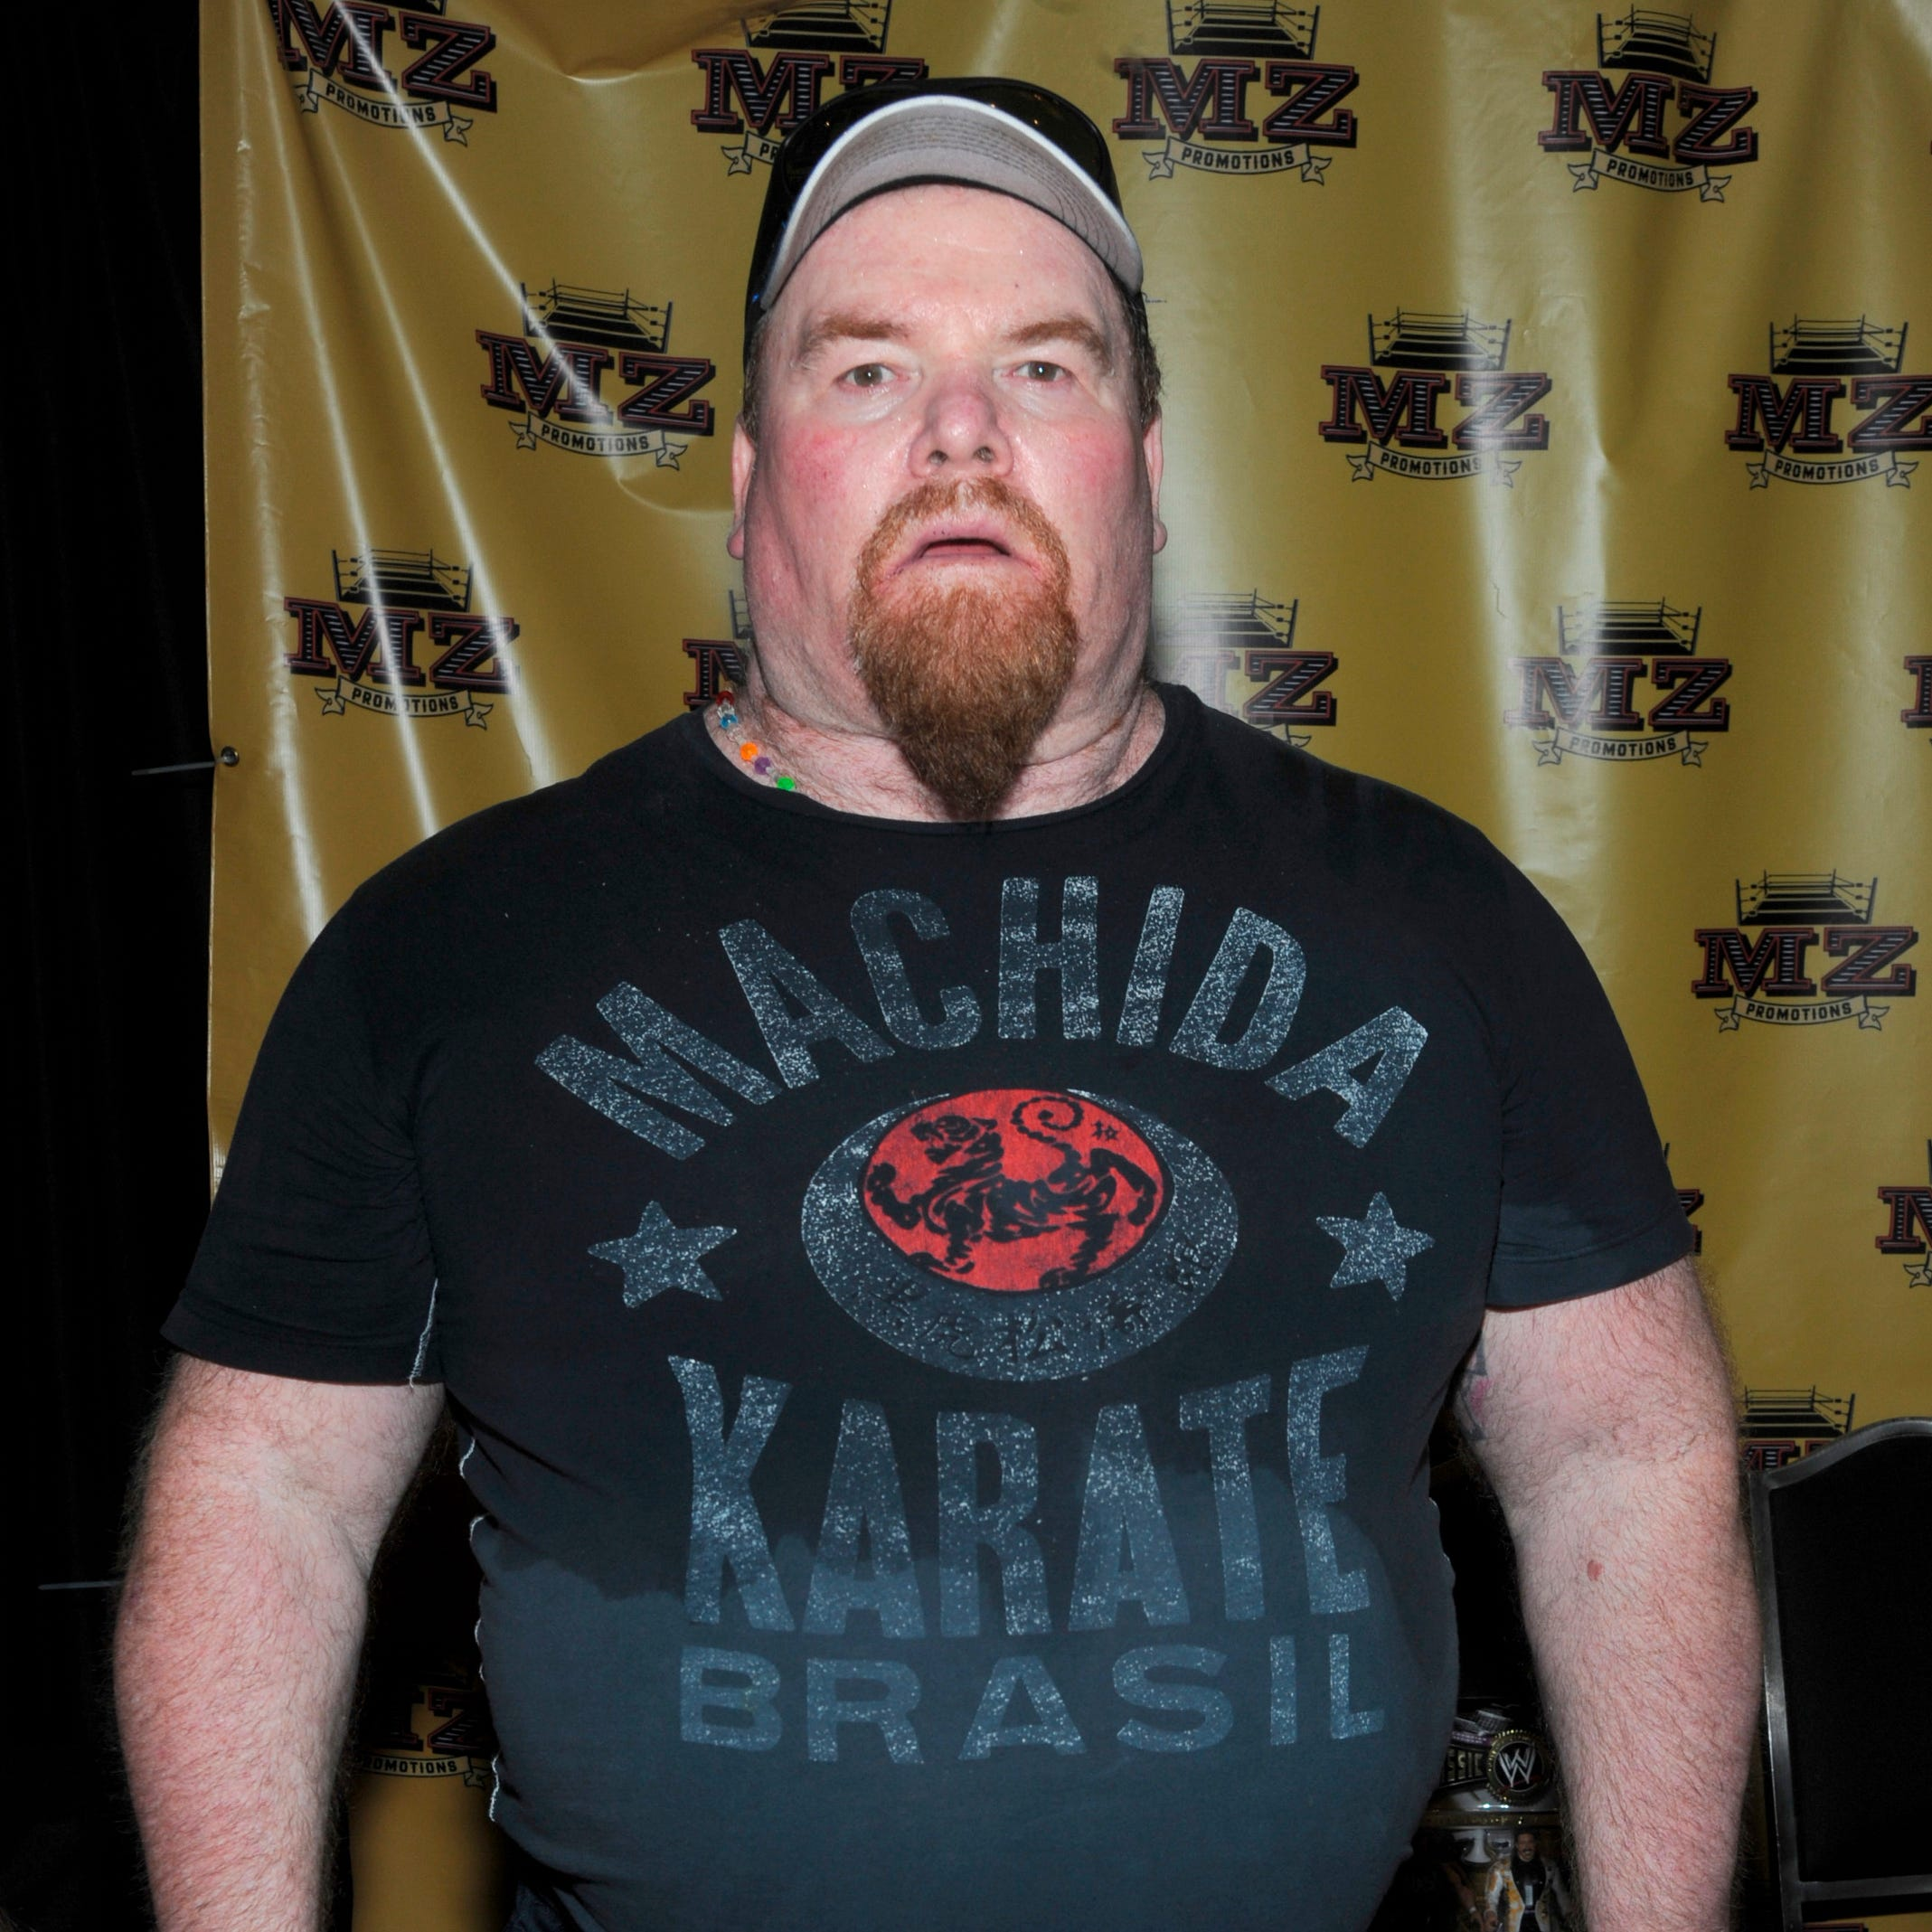 WWE wrestler Jim 'The Anvil' Neidhart, father of 'Total Divas' Natalya, dies at 63